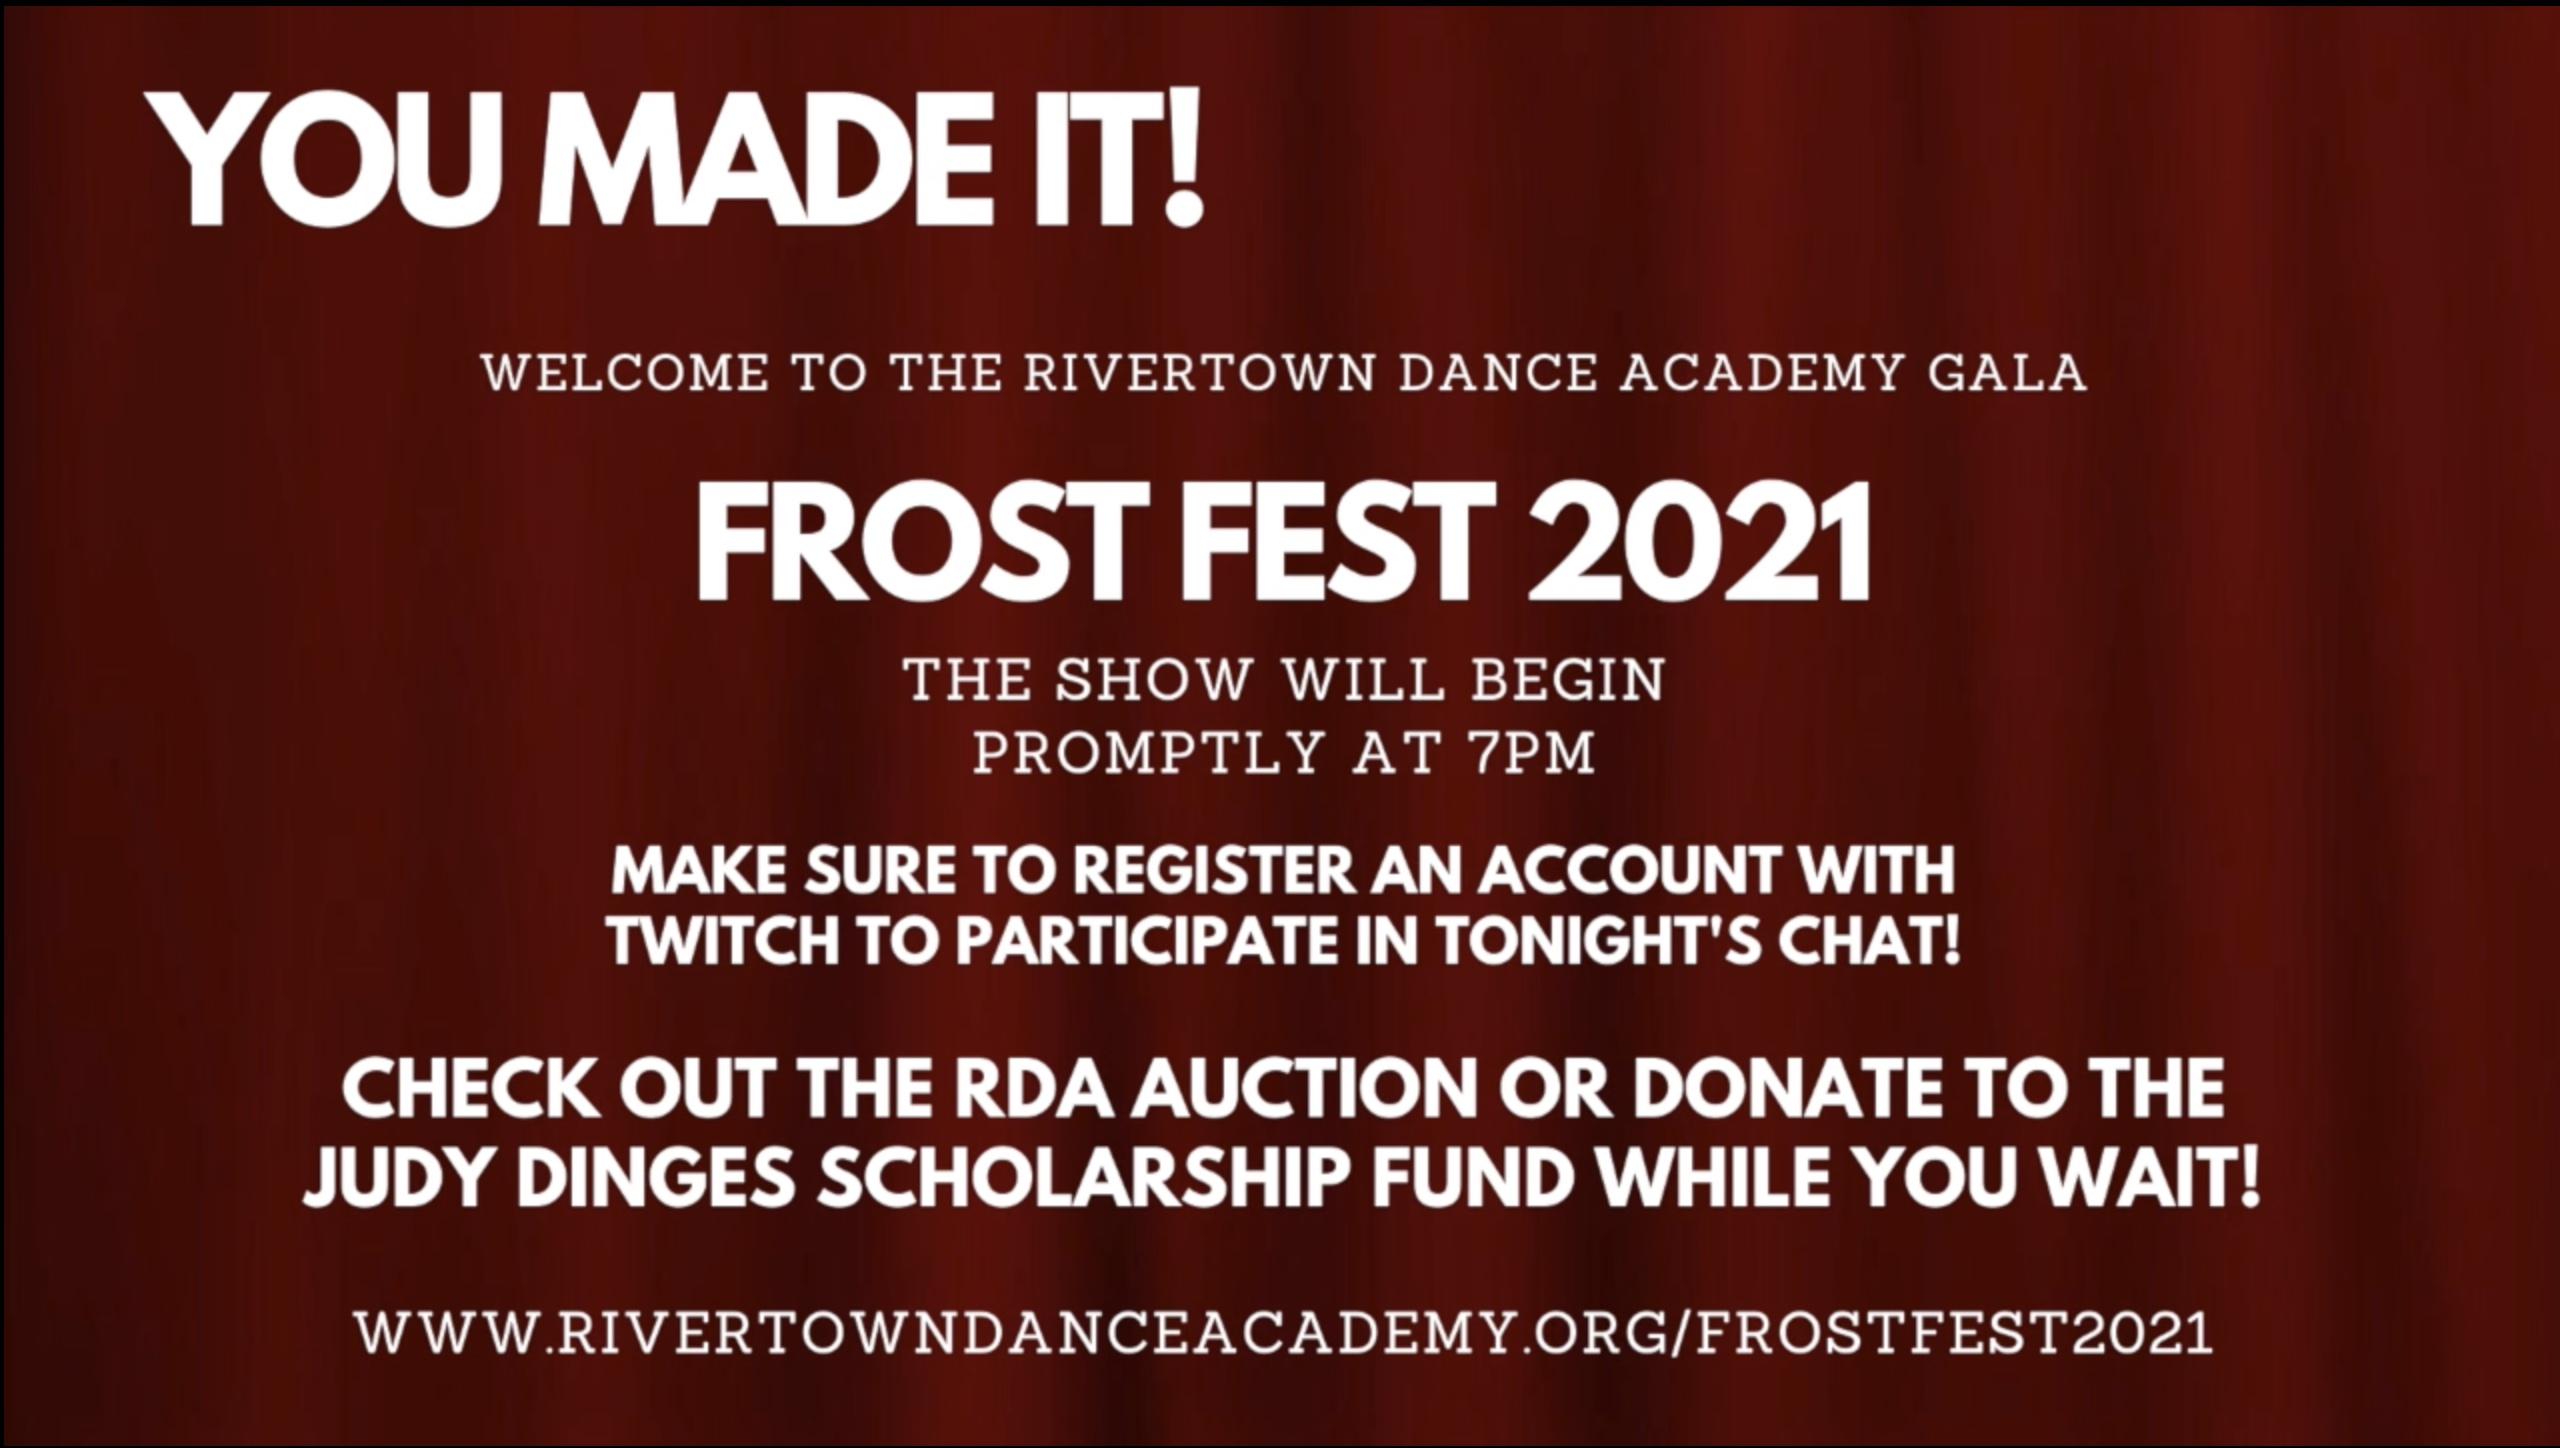 Frostfest2021